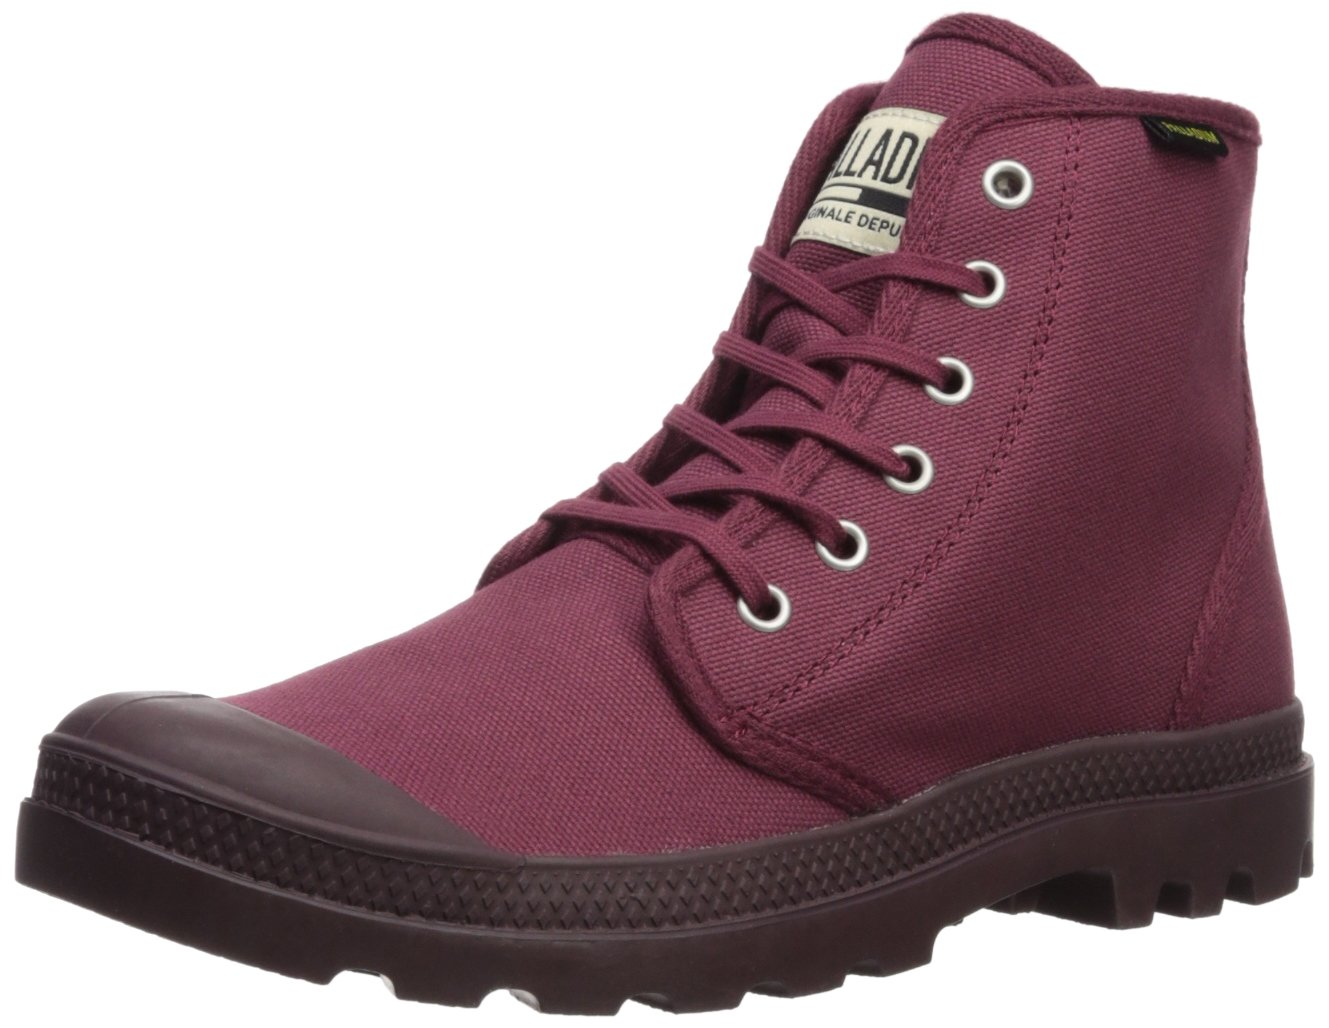 Palladium Pampa Hi Orginale Ankle Boot B074B58TH8 8.5 M US|Red-604